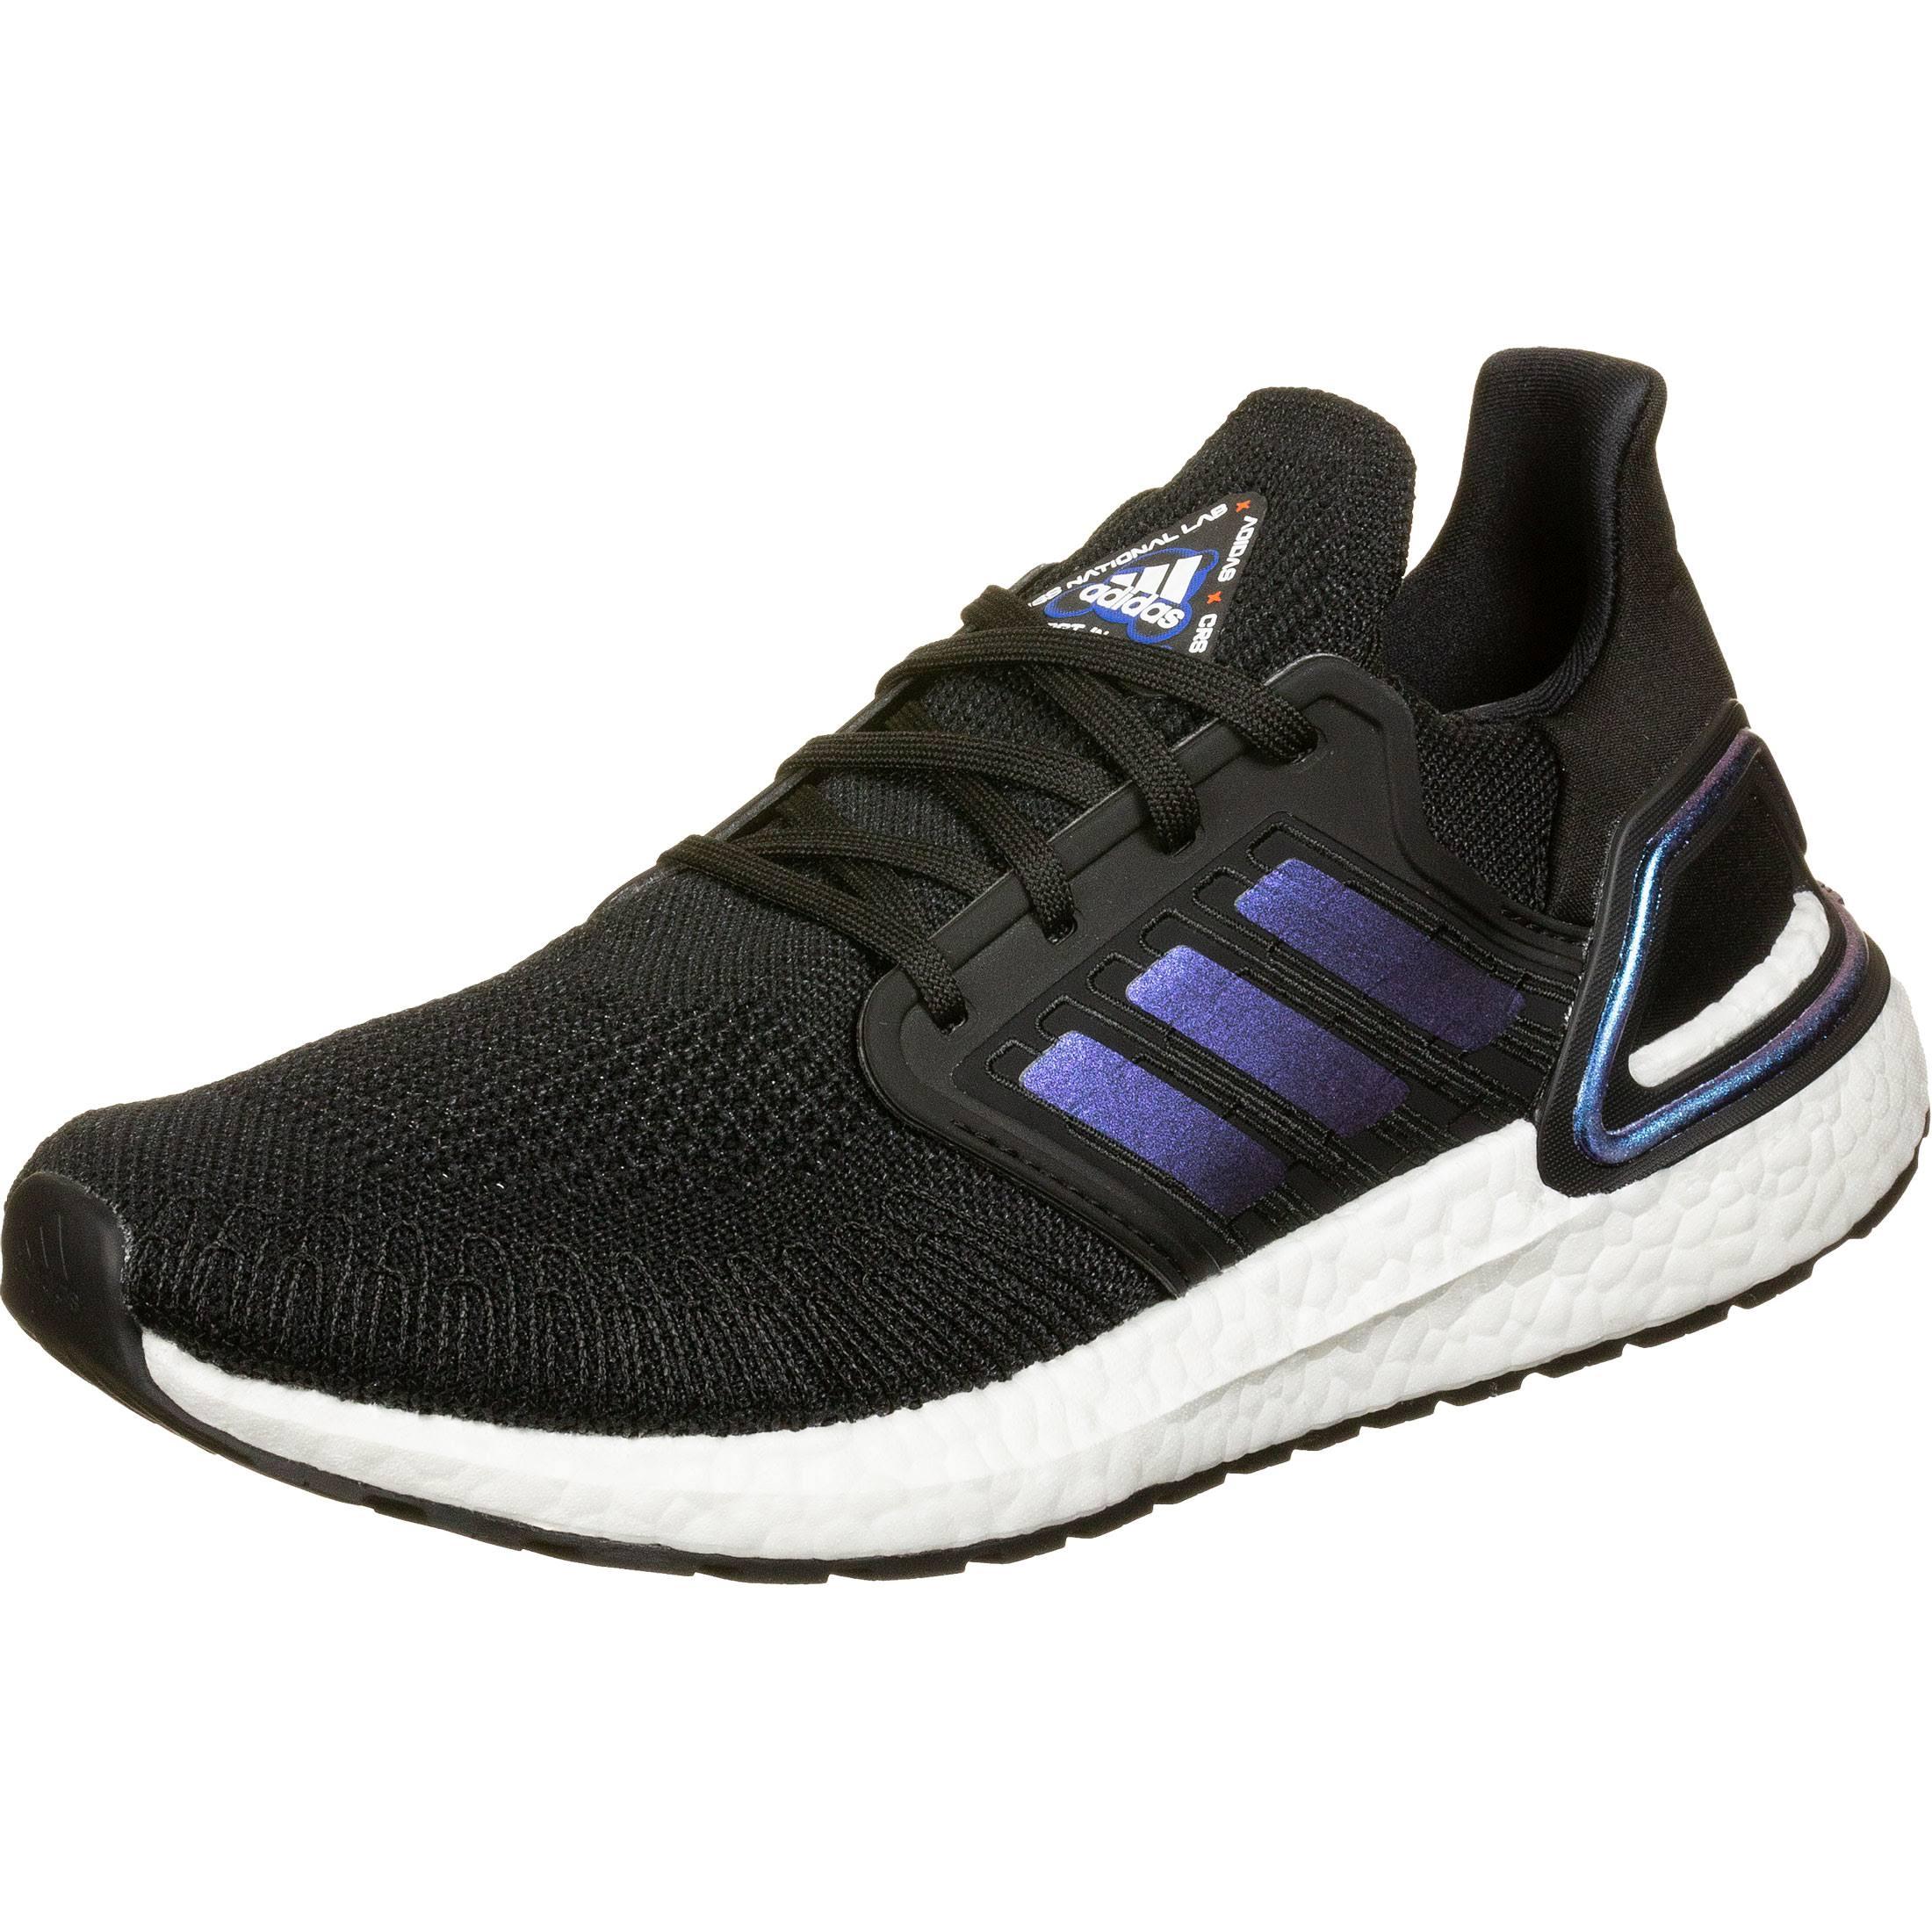 Adidas Ultraboost 20 Shoes Running - Black